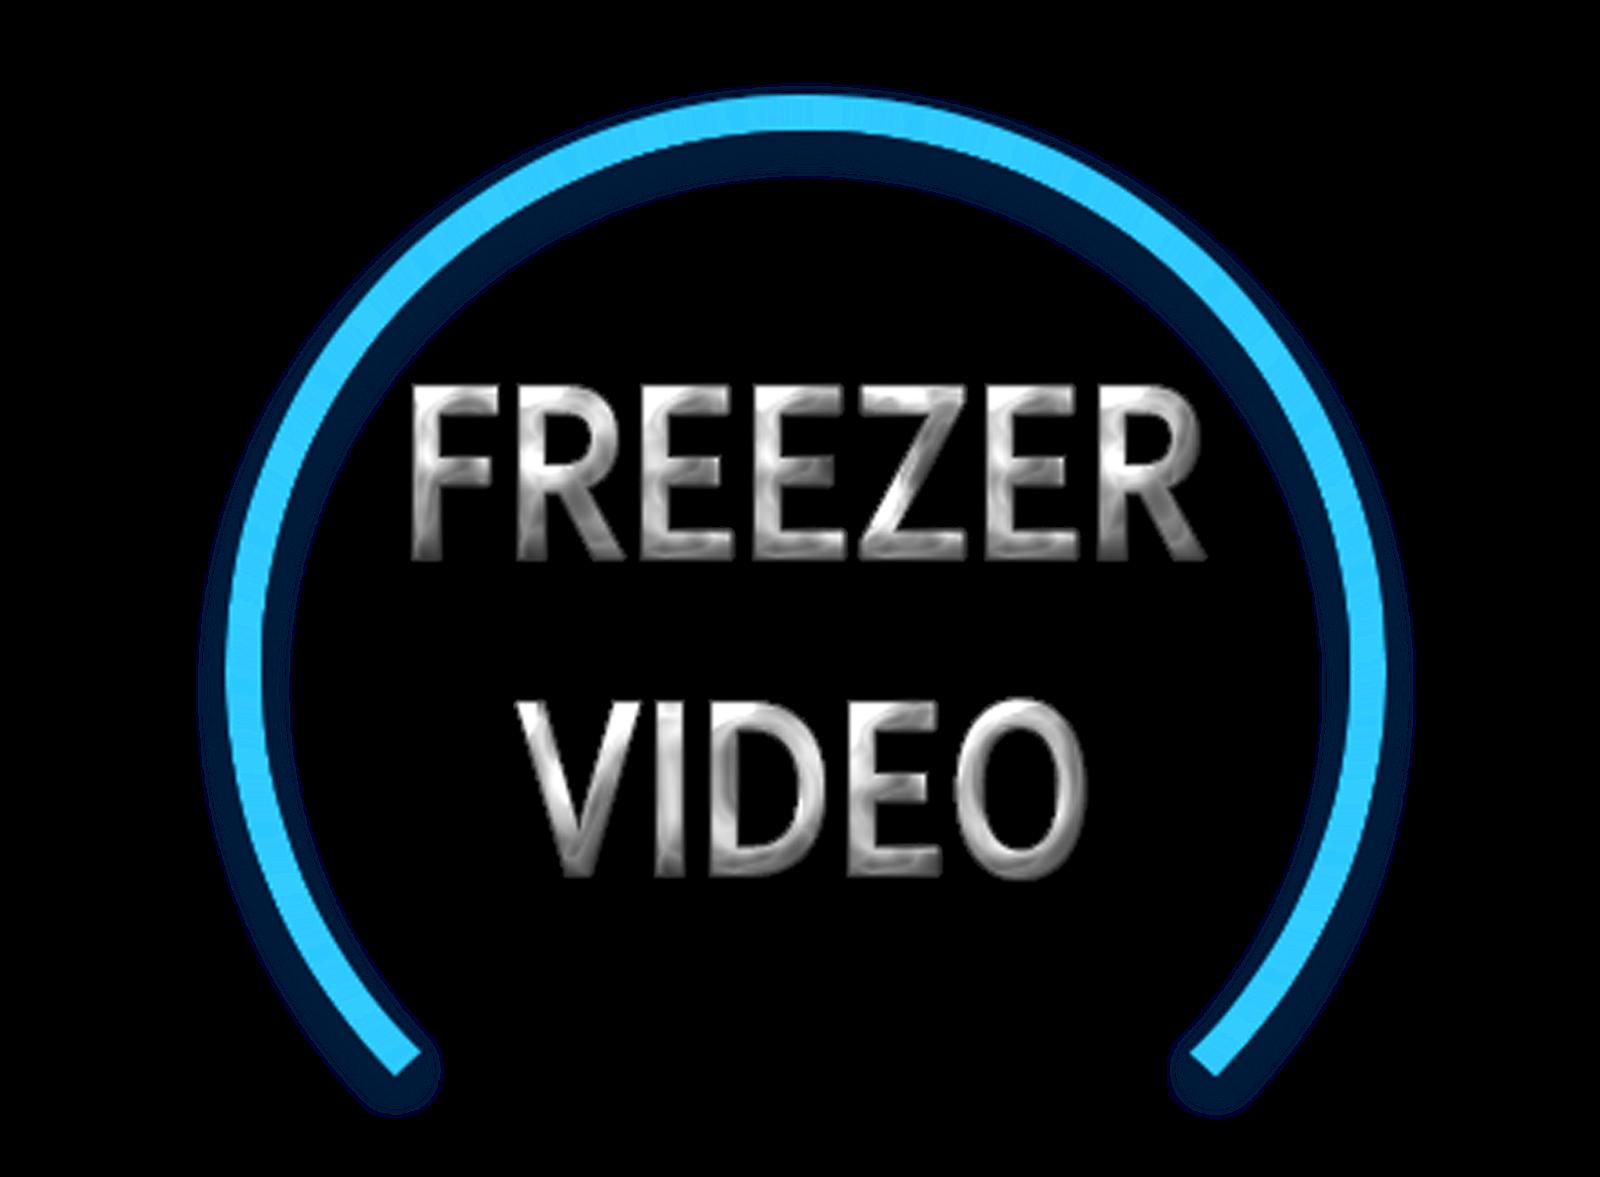 FREEZER VIDEO